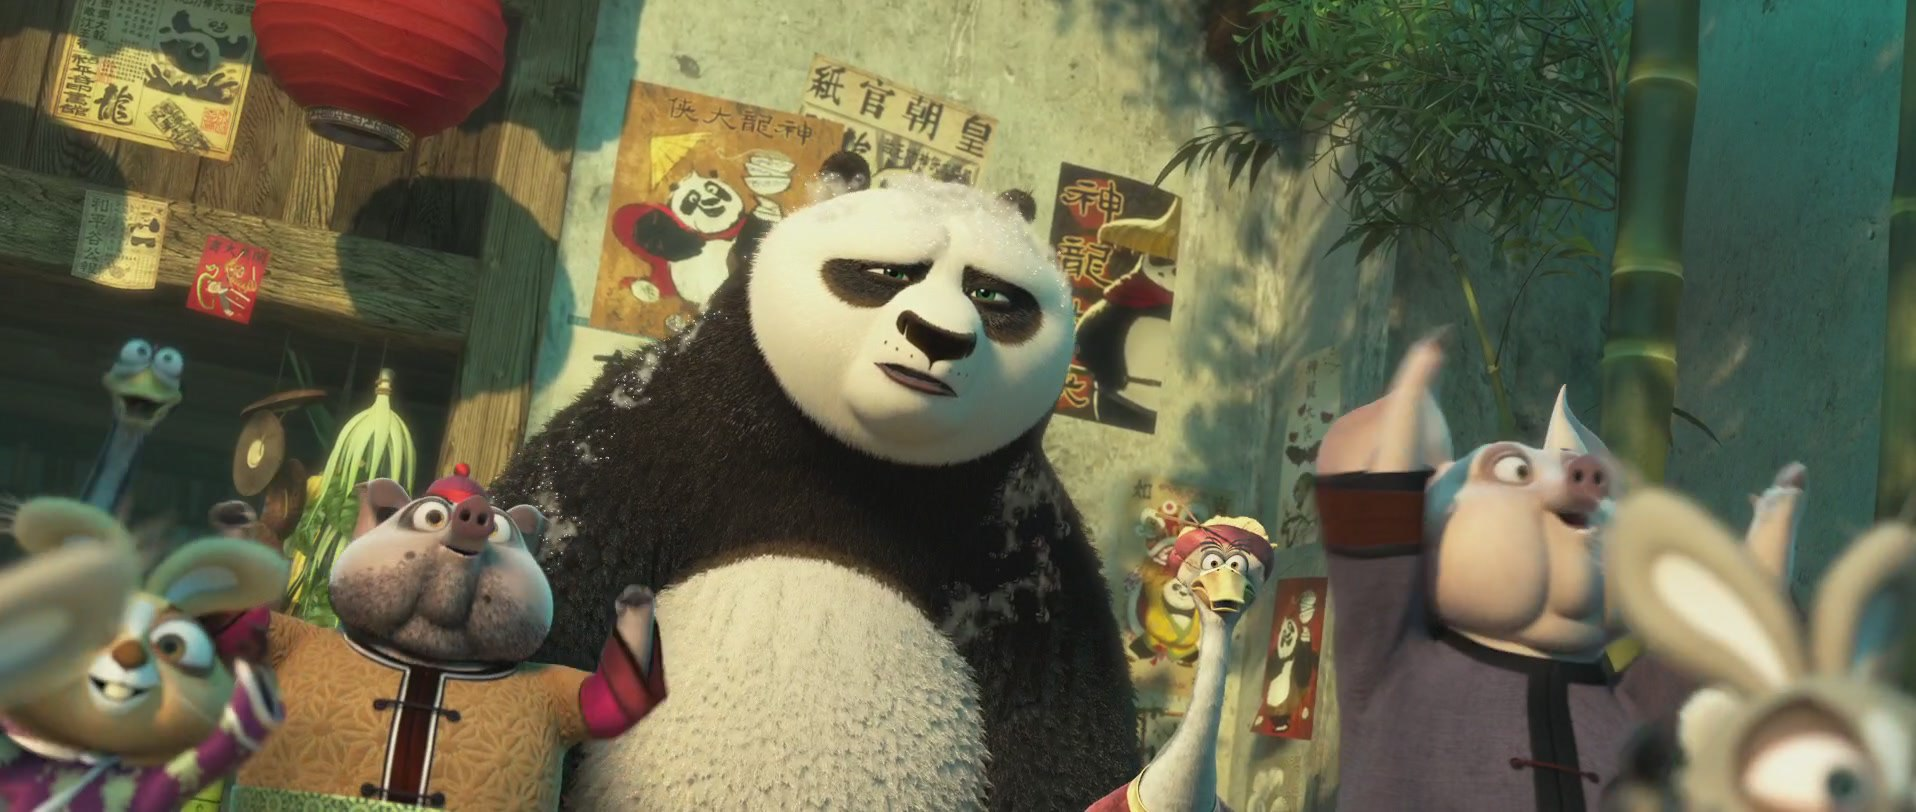 панда кунг-фу недовальная